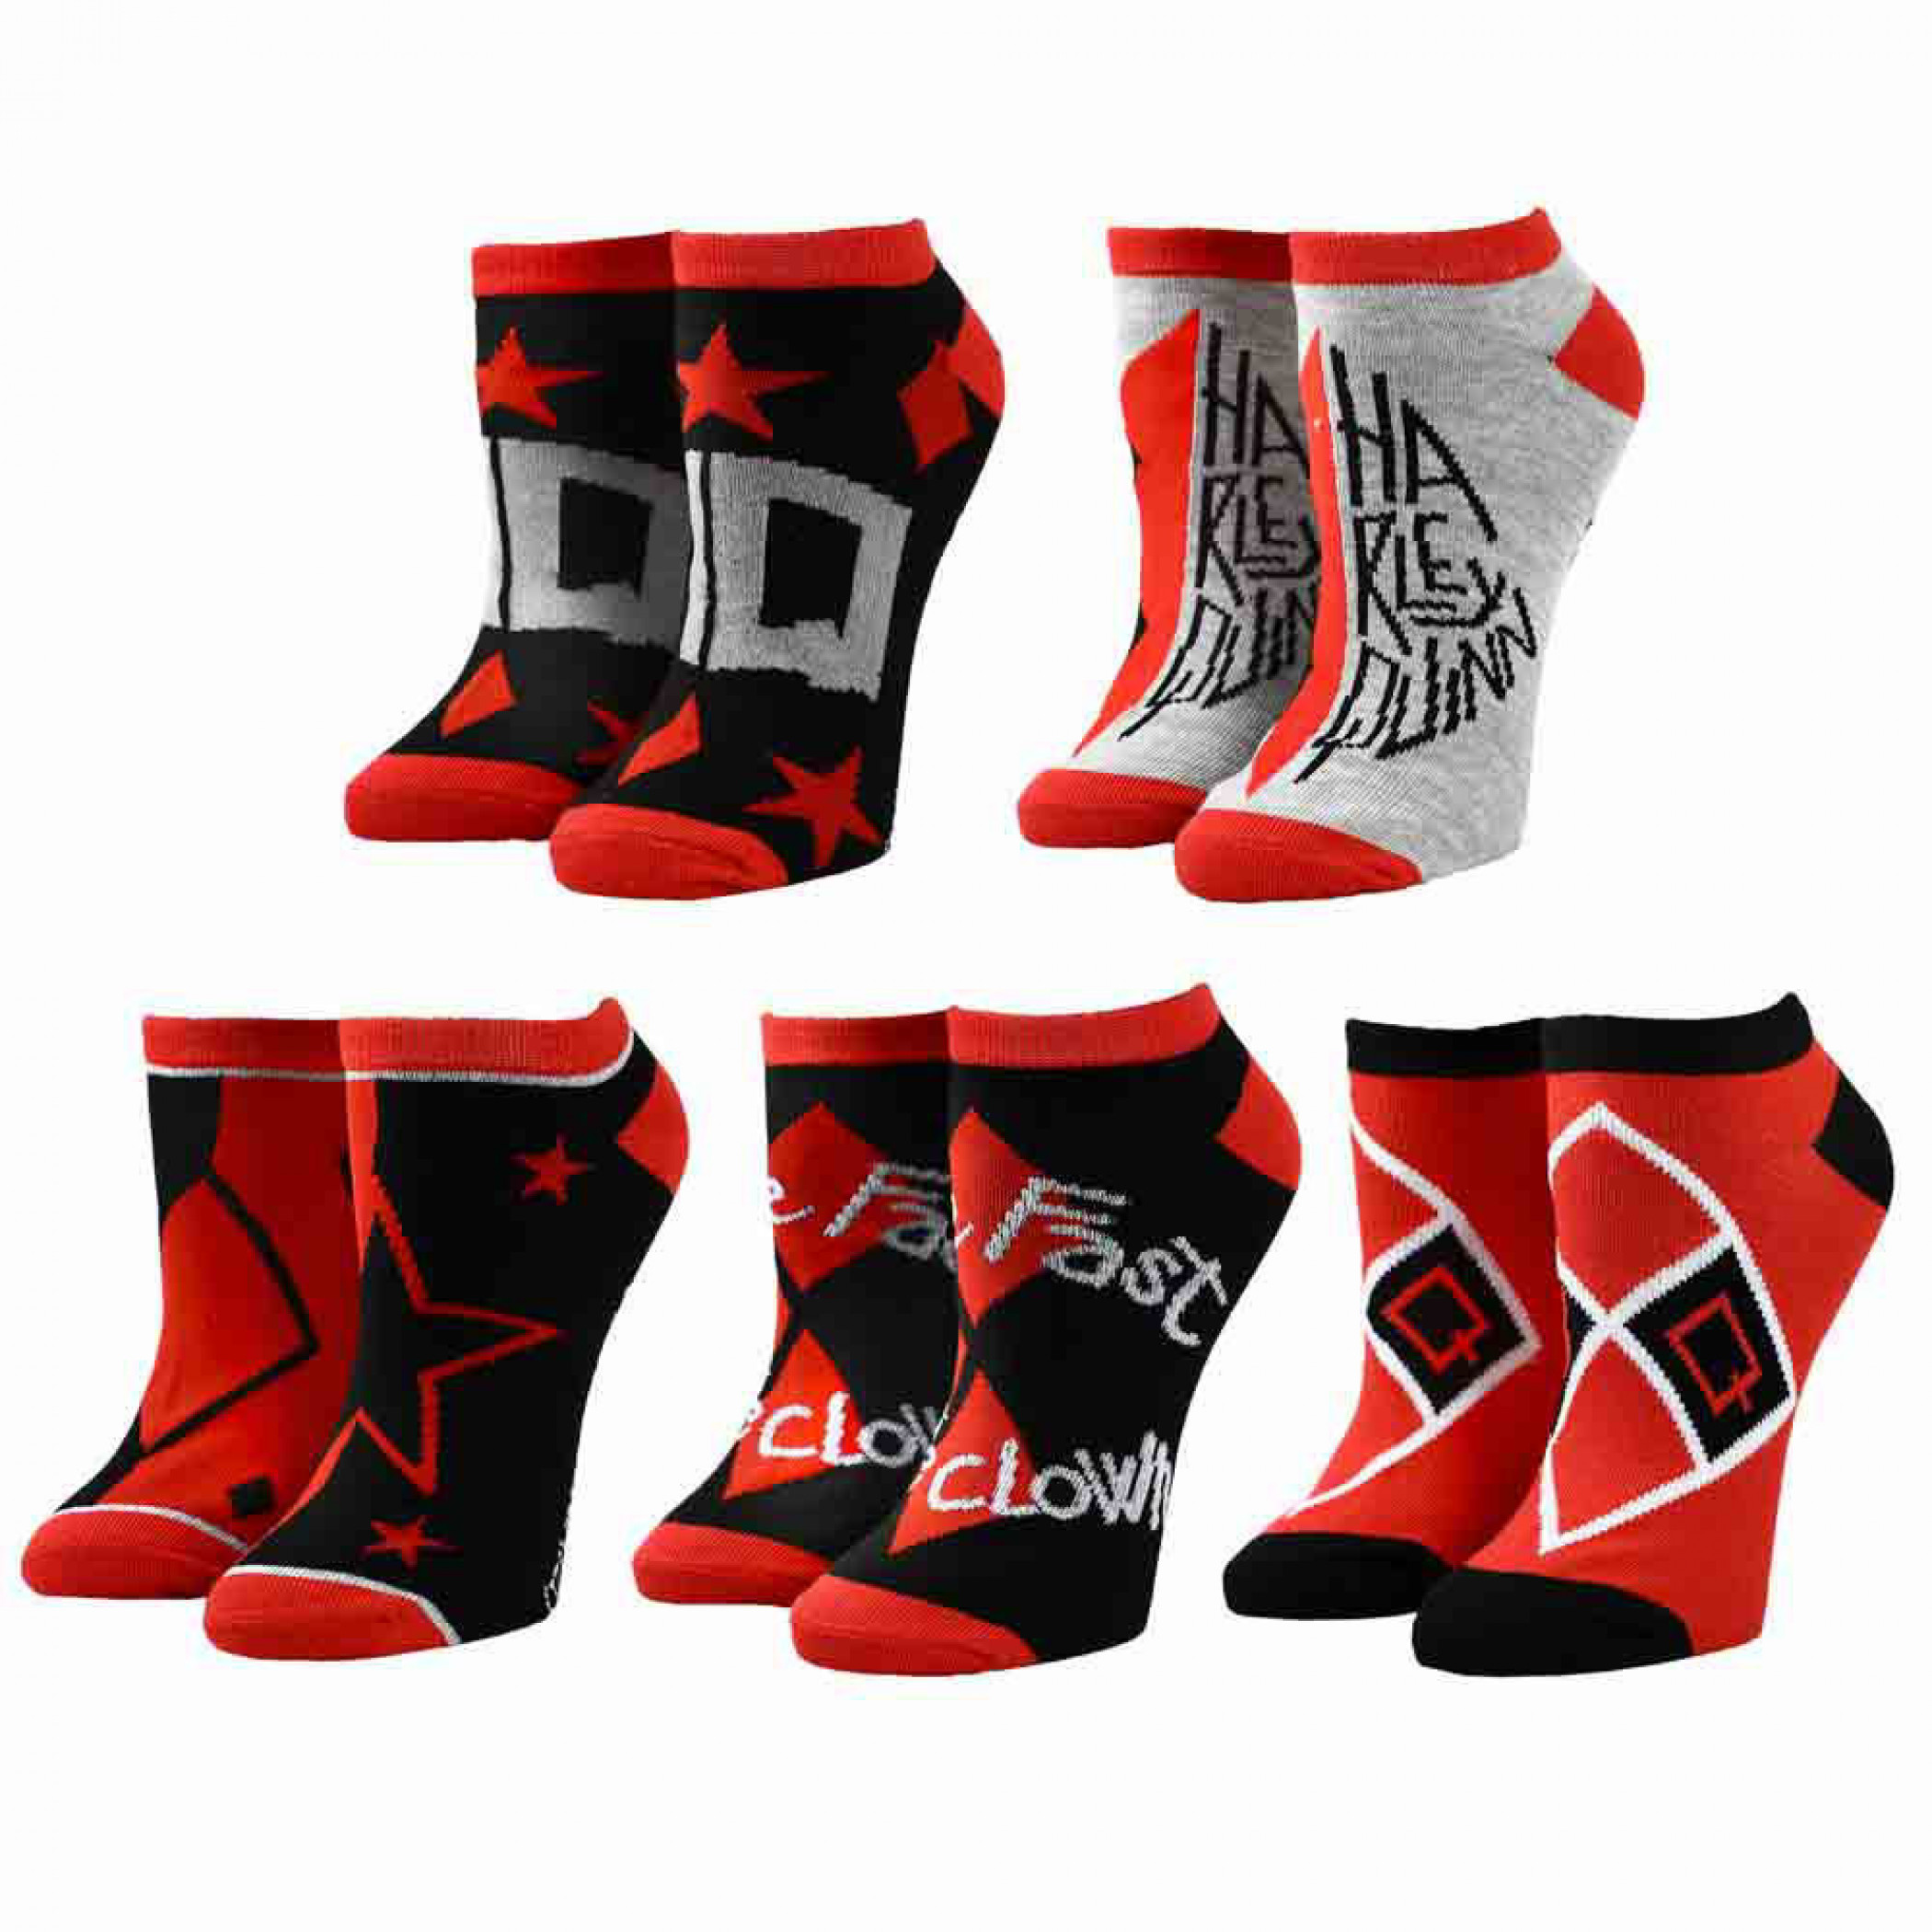 DC Comics Suicide Squad Harley Quinn Ankle Socks 5-Pack